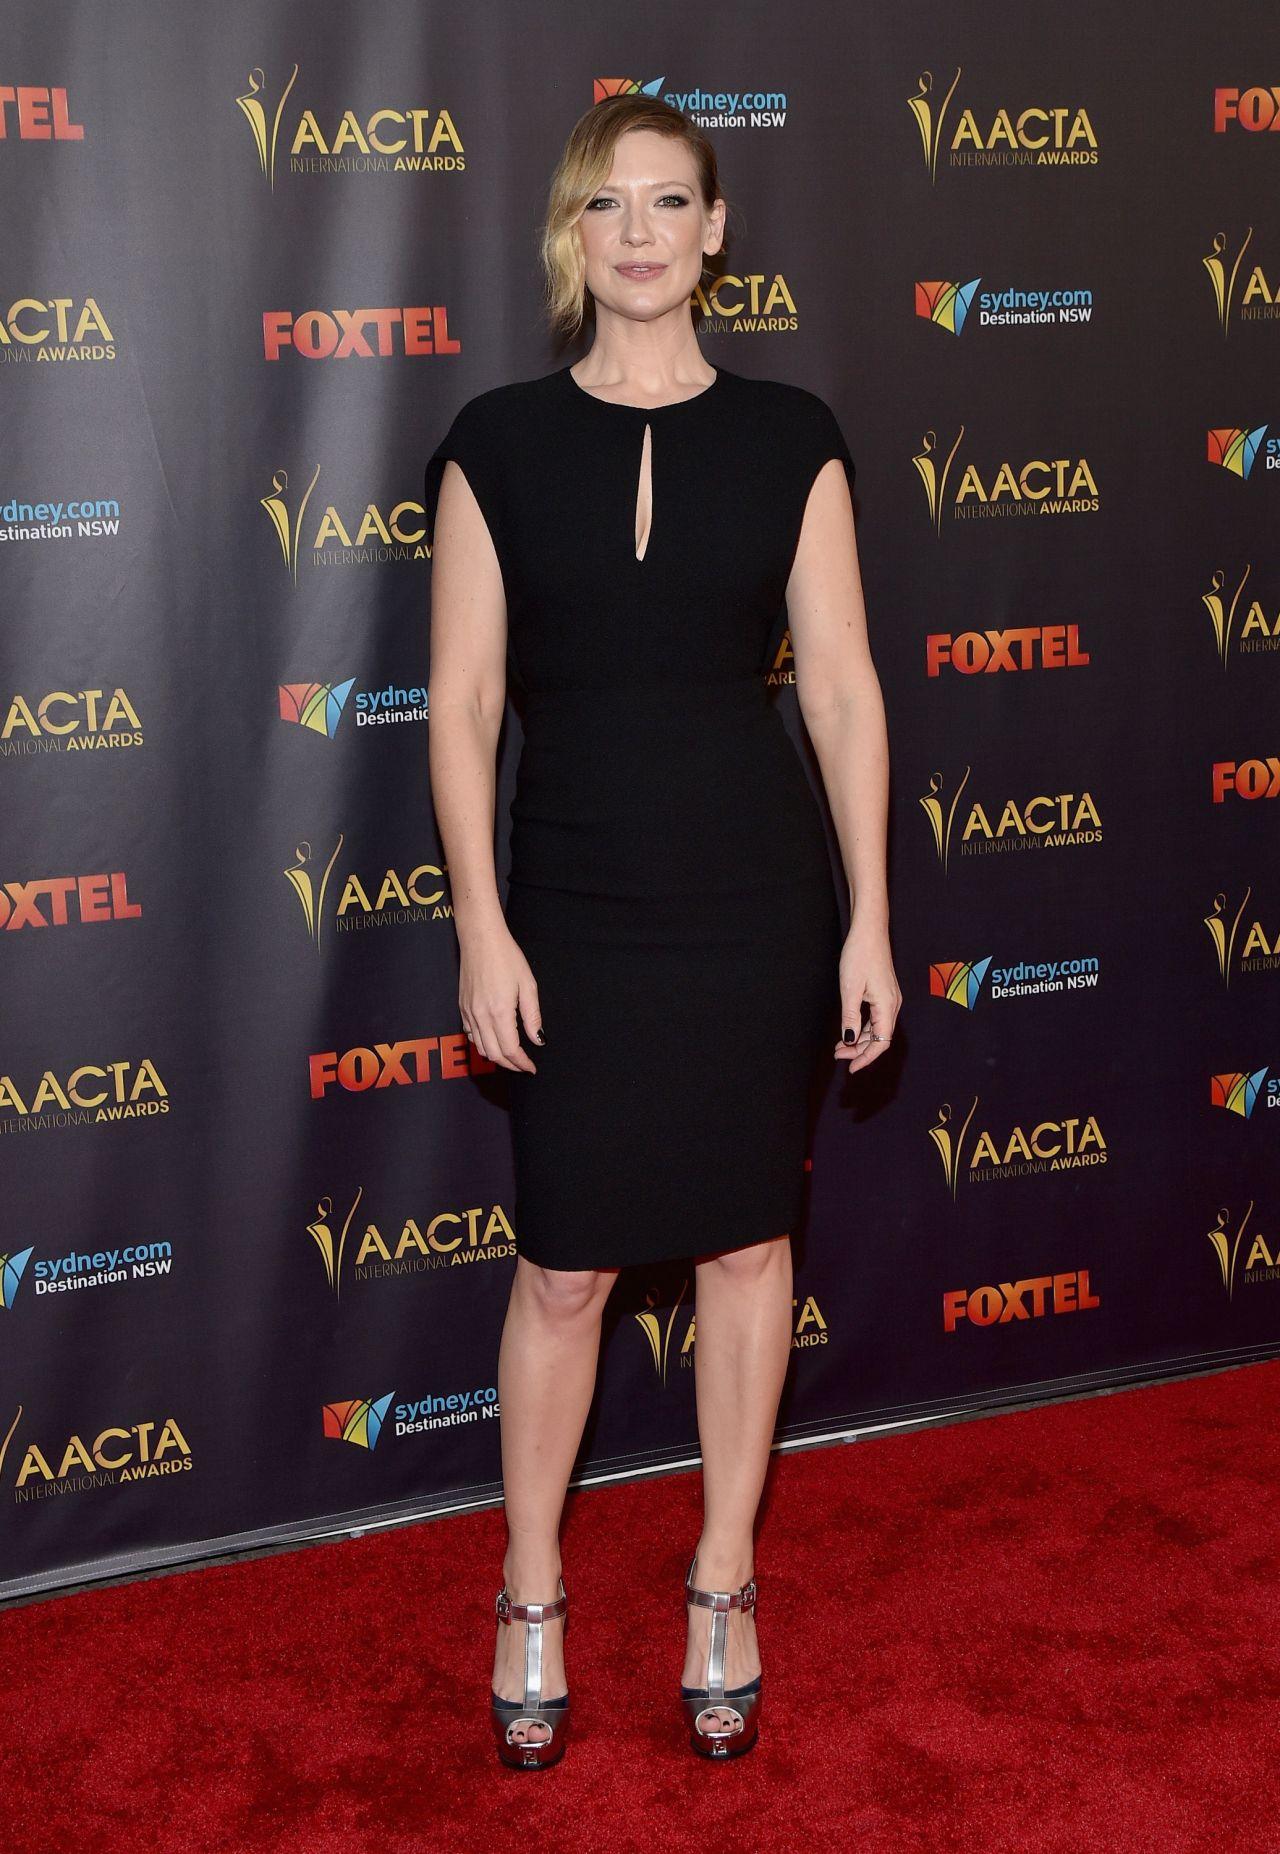 aacta awards - photo #49